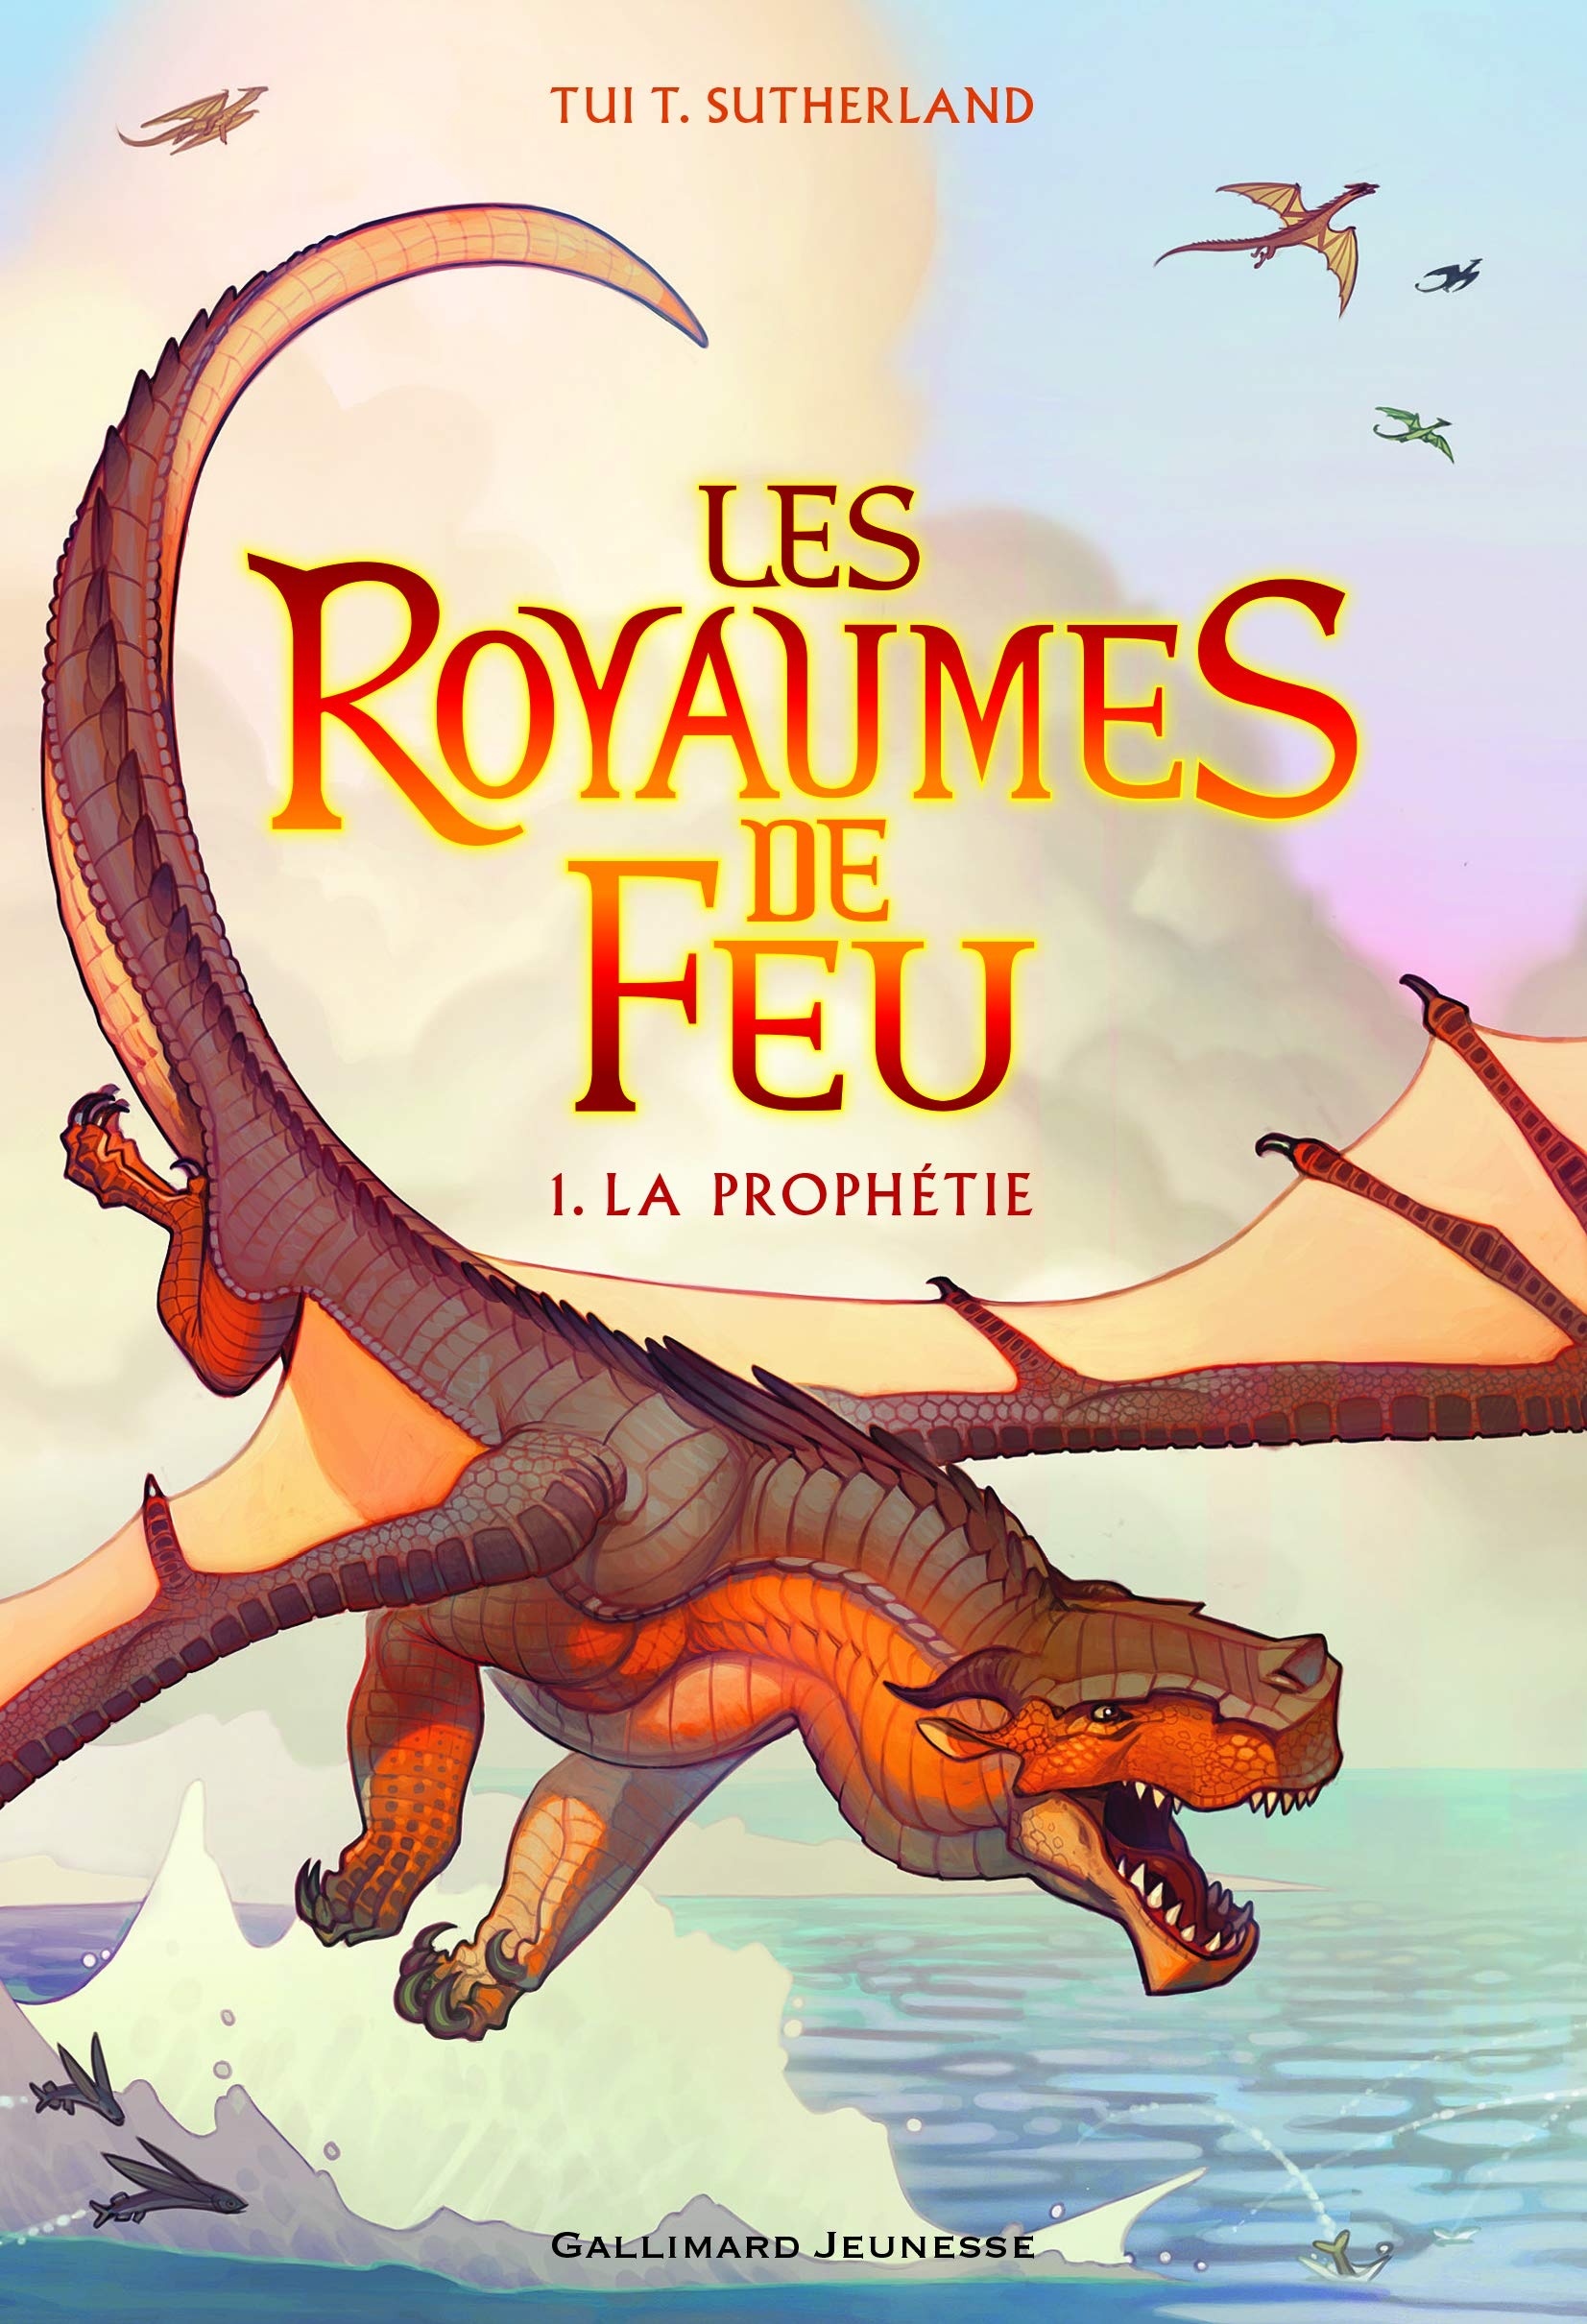 Les Royaumes de Feu, 1: La Prophétie (Romans Junior) (French Edition):  Sutherland, Tui T., Rubio-Barreau, Vanessa: 9782070661831: Amazon.com: Books